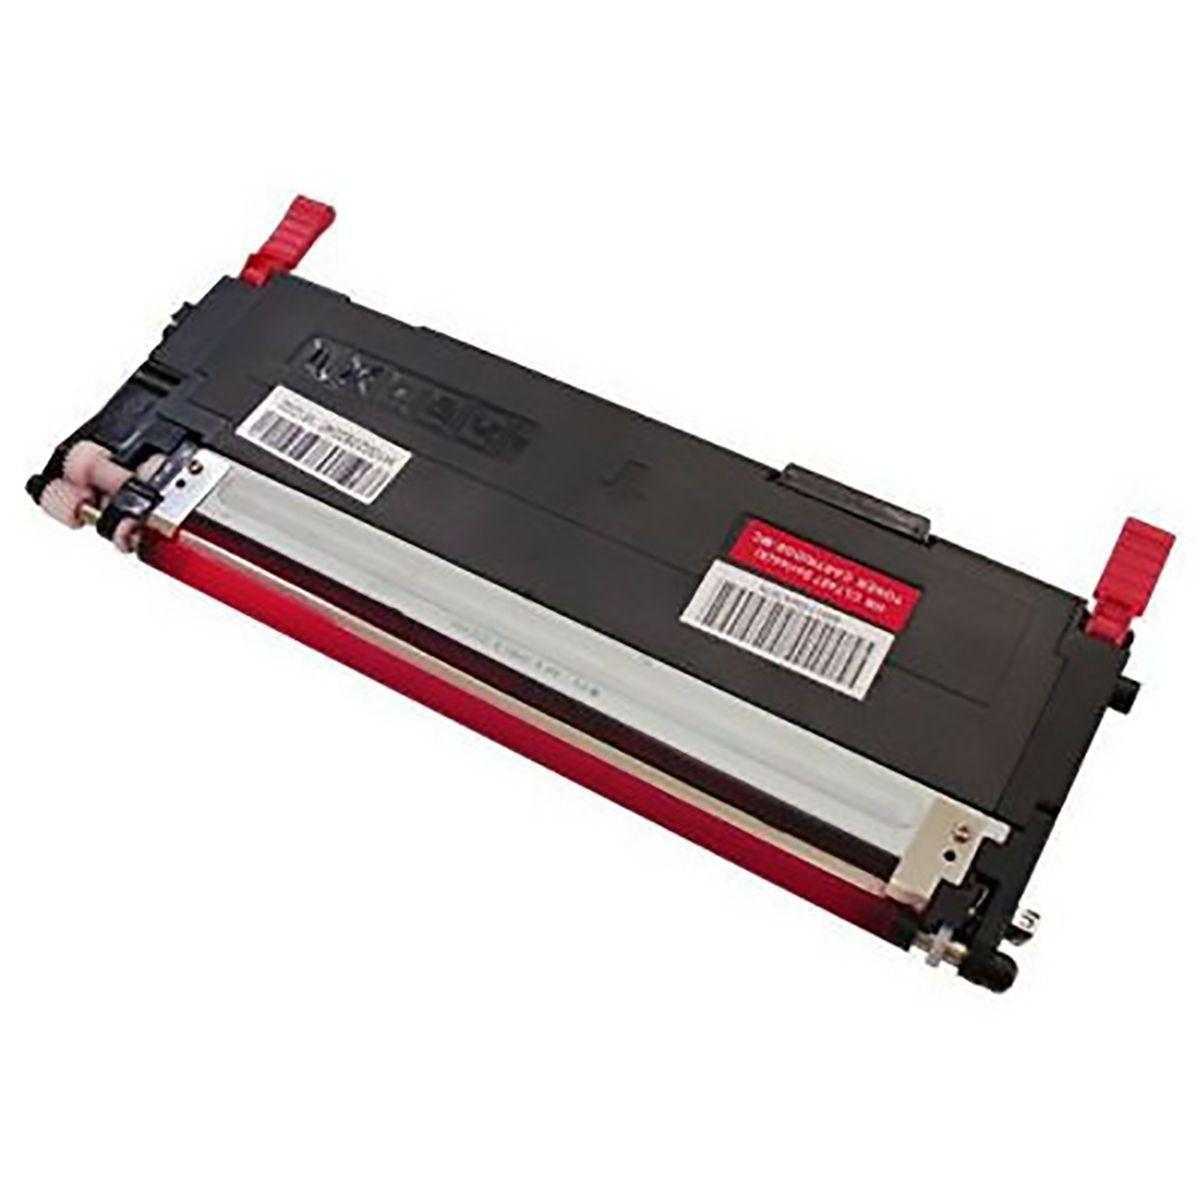 Compatível: Toner CLT-407S M407 para Samsung CLX-3185fw CLX-3185n CLX-3185fn 3185 CLP325 CLP320 / Magenta / 1.000